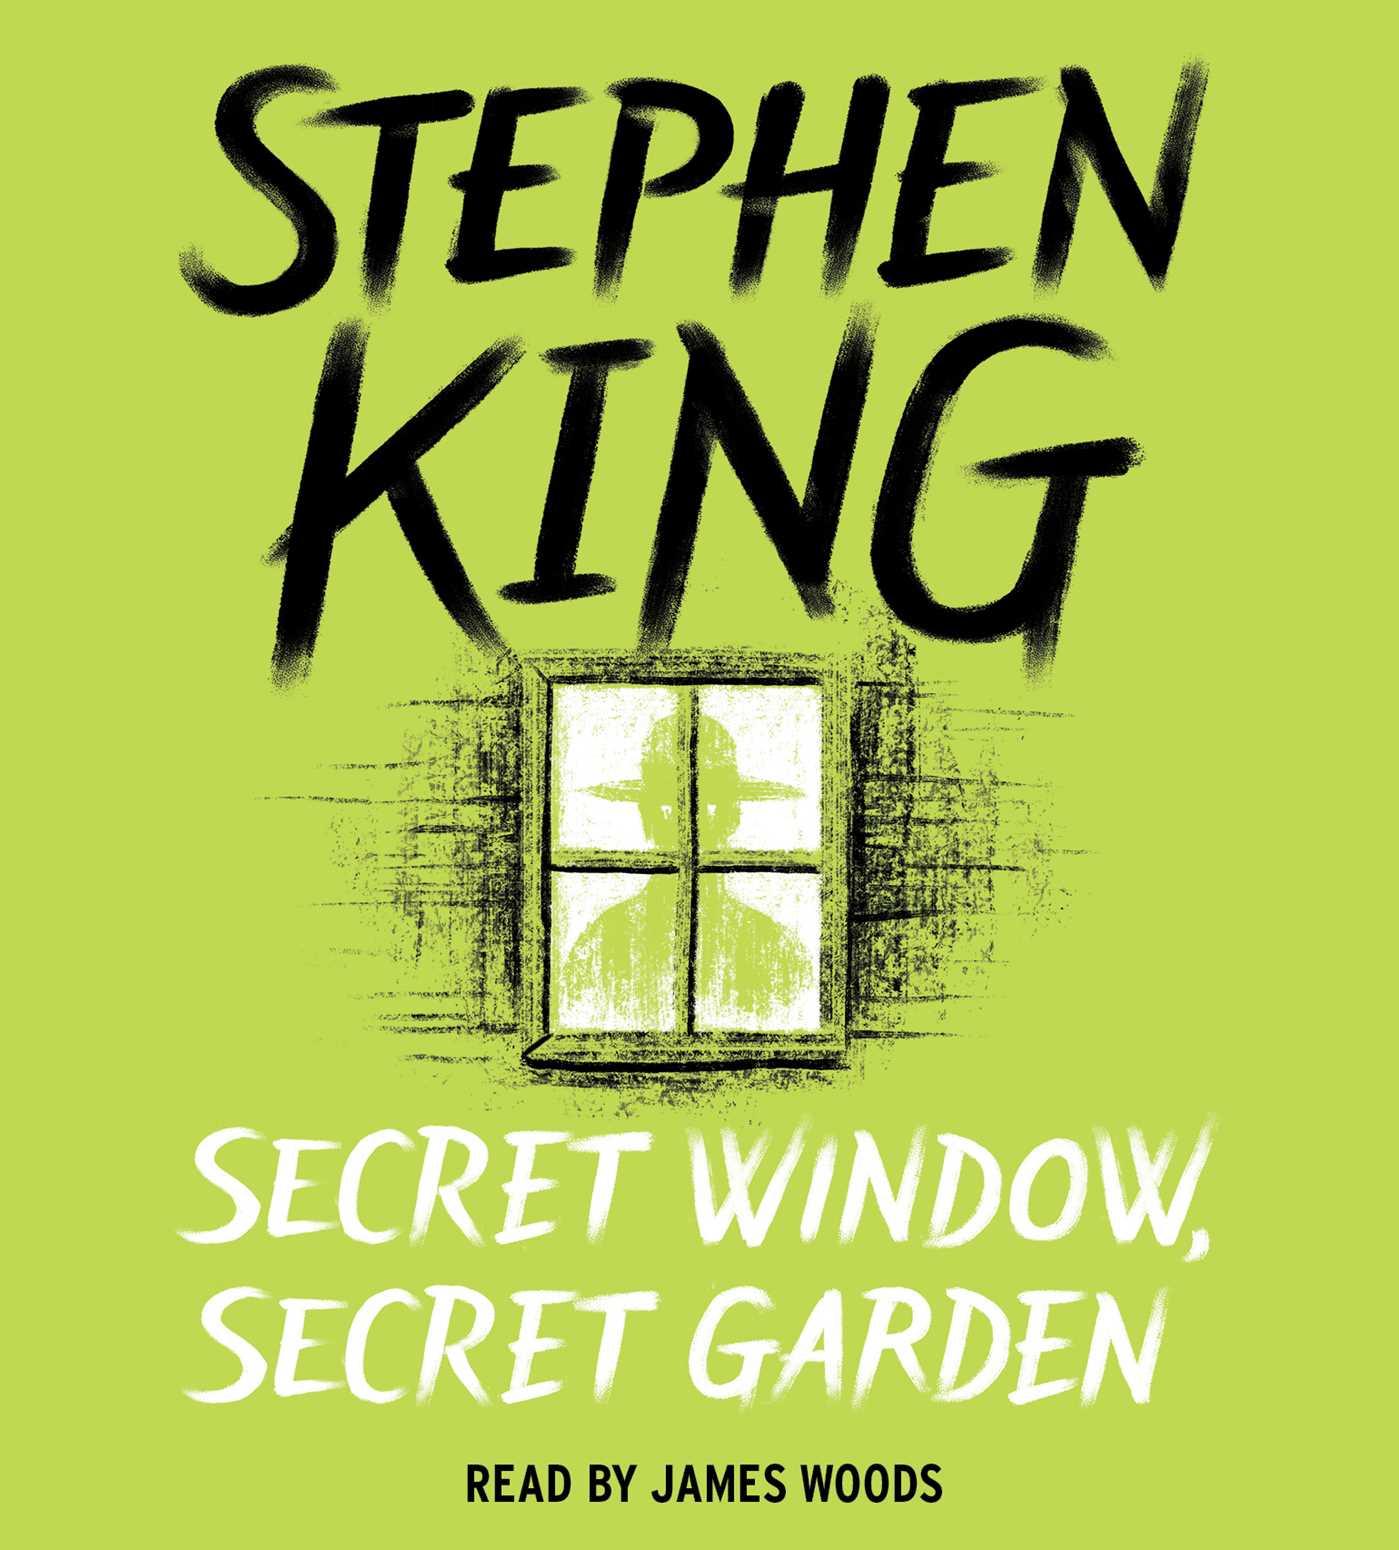 American Service Foundation >> Secret Window, Secret Garden Audiobook on CD by Stephen King, James Woods | Official Publisher ...